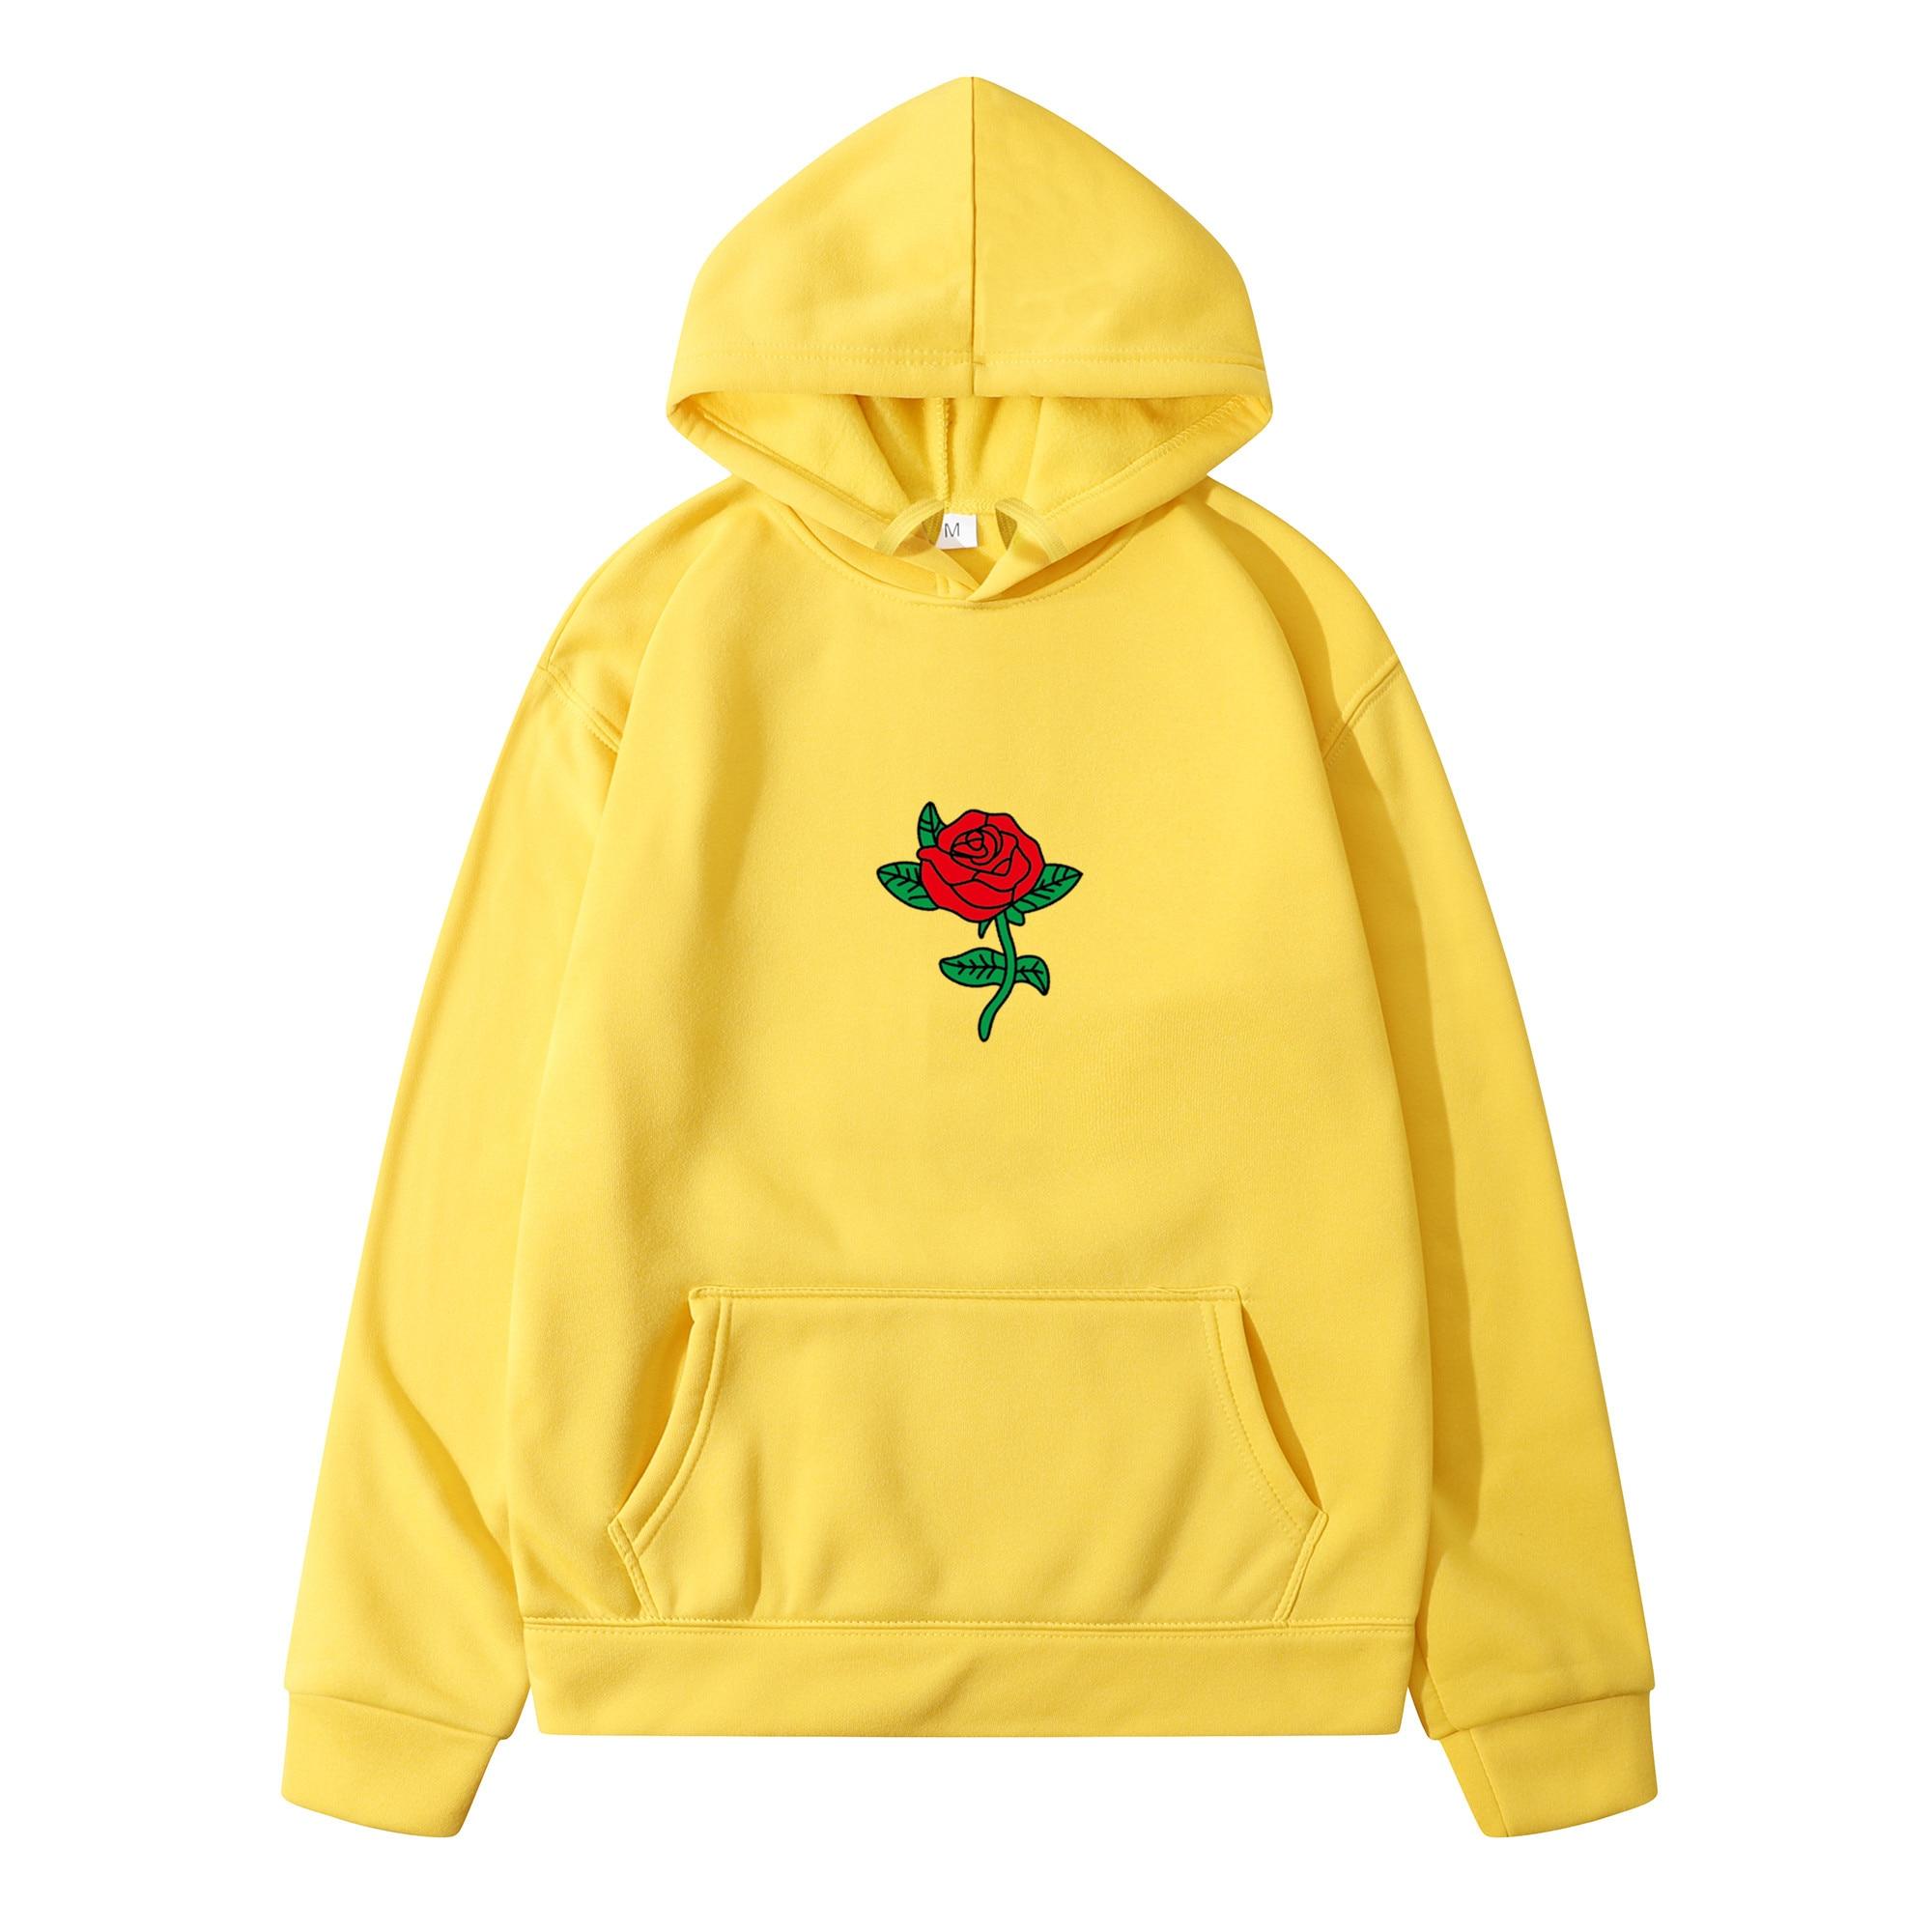 New Fashion 2020 Autumn Winter Latest Harajuku Poison Rose Print Hoodies High Quality Men Women Hip Hop Streetwear Clothing